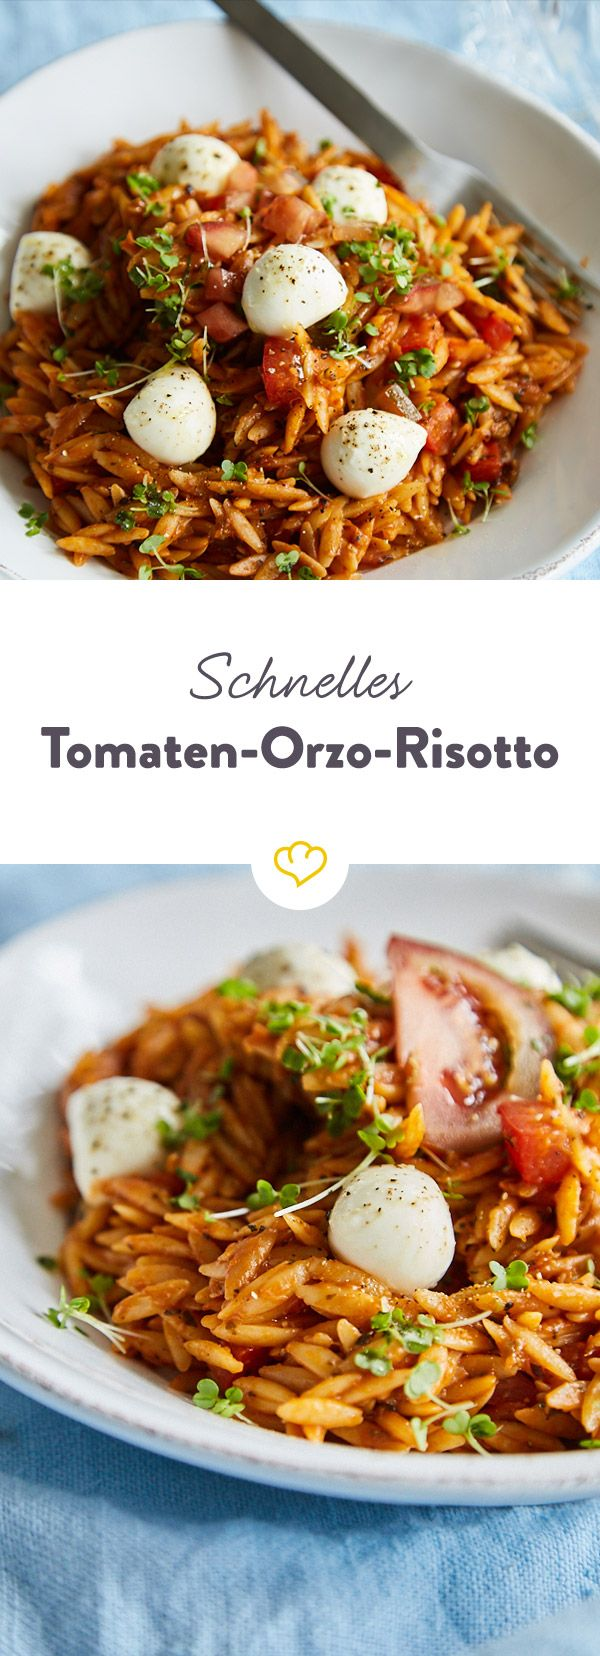 Schnelles Tomaten-Orzo-Risotto mit Mini-Mozzarella #vejetaryentarifleri